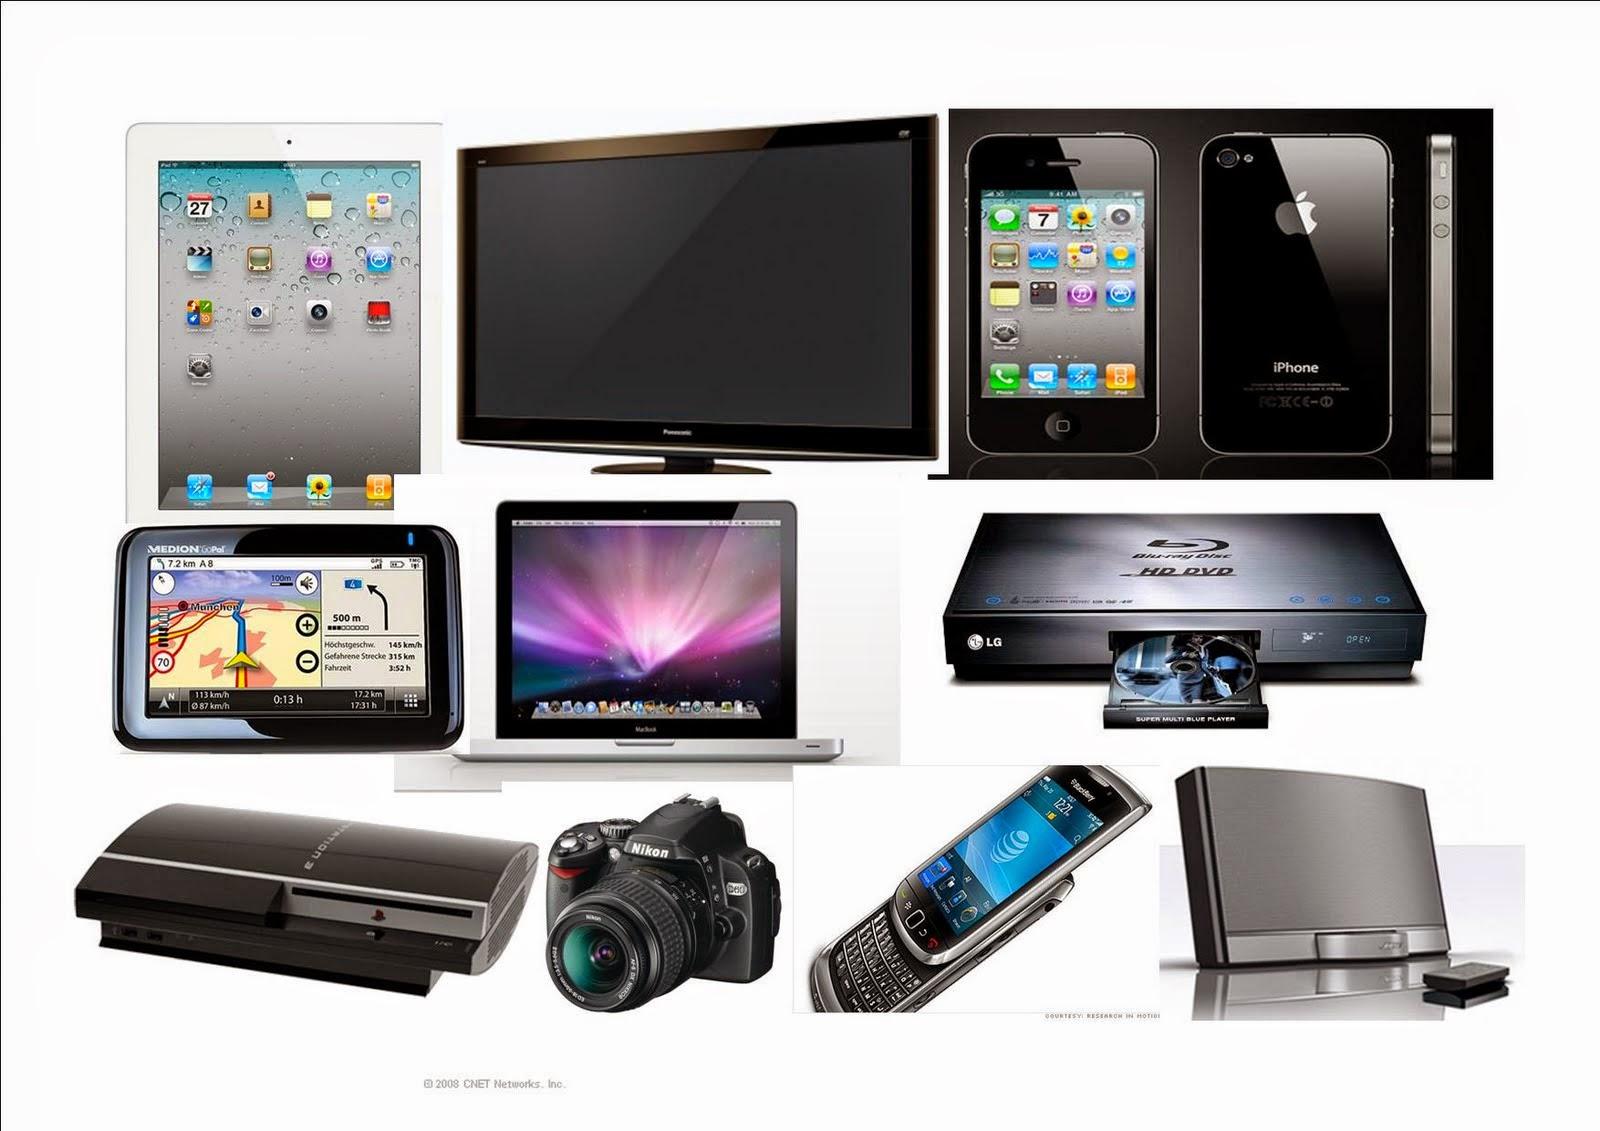 Gambar Pengaruh Teknologi Blog Lingkungan Dan Kehutanan Irwanto Forester Teknologi Komunikasi Pengaruh Penggunaan Gadget Di Kalangan Mahasiswa